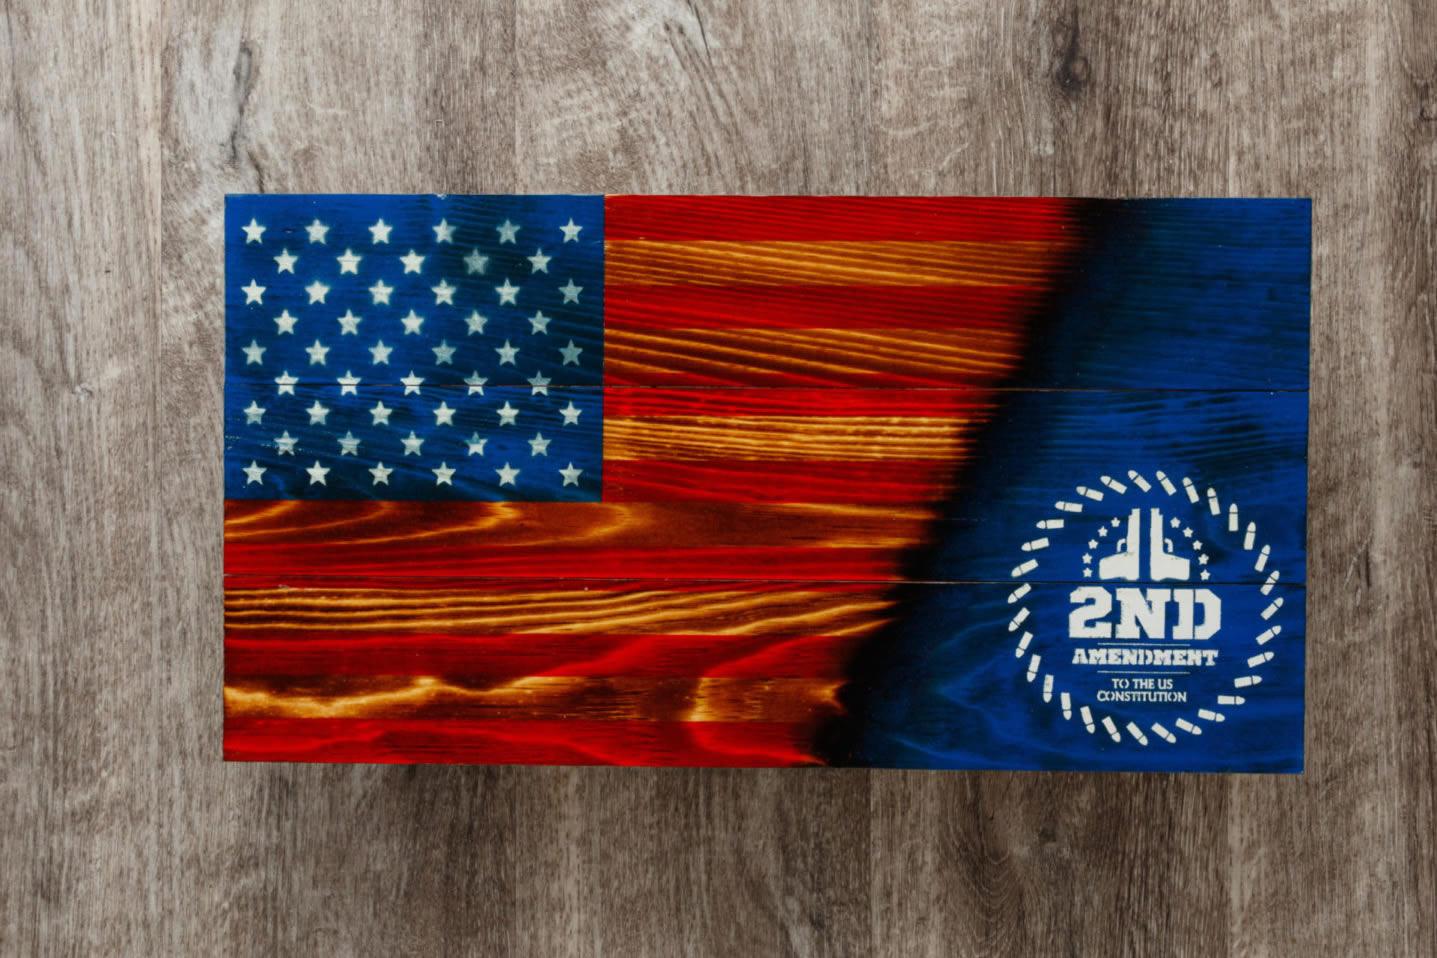 2nd Amendment wooden American flag wall art